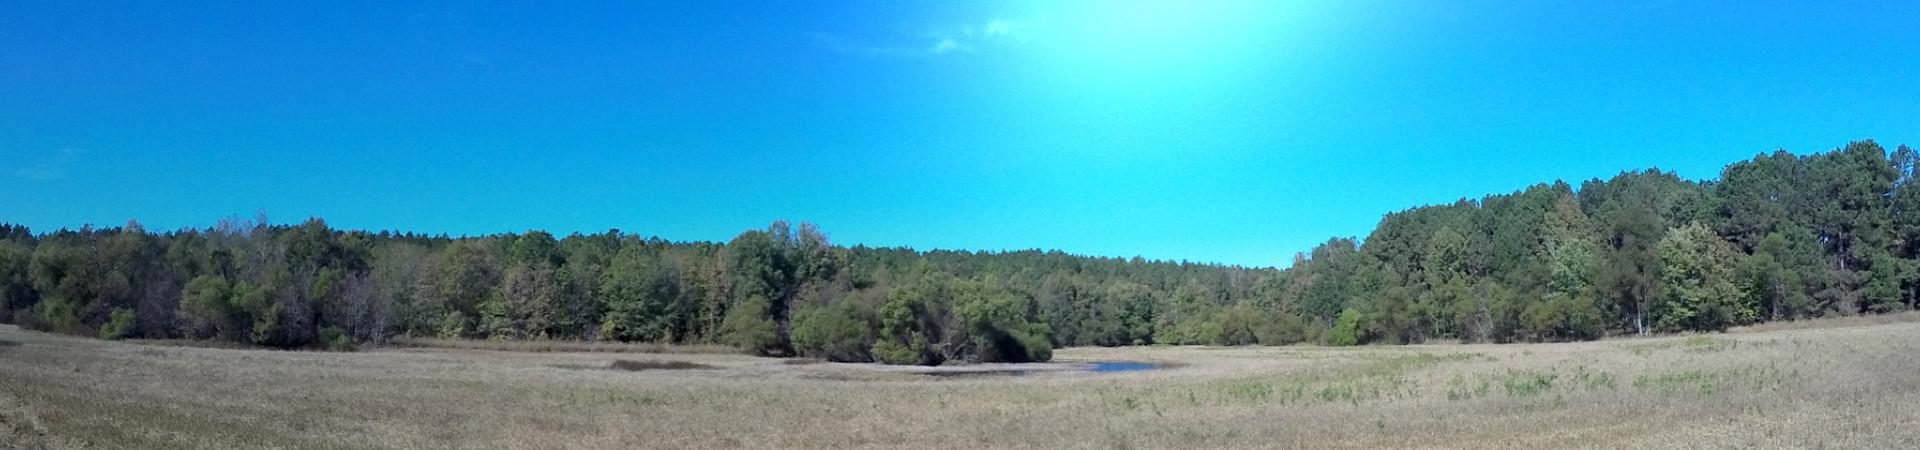 waterfowl impoundment at Oconee WMA